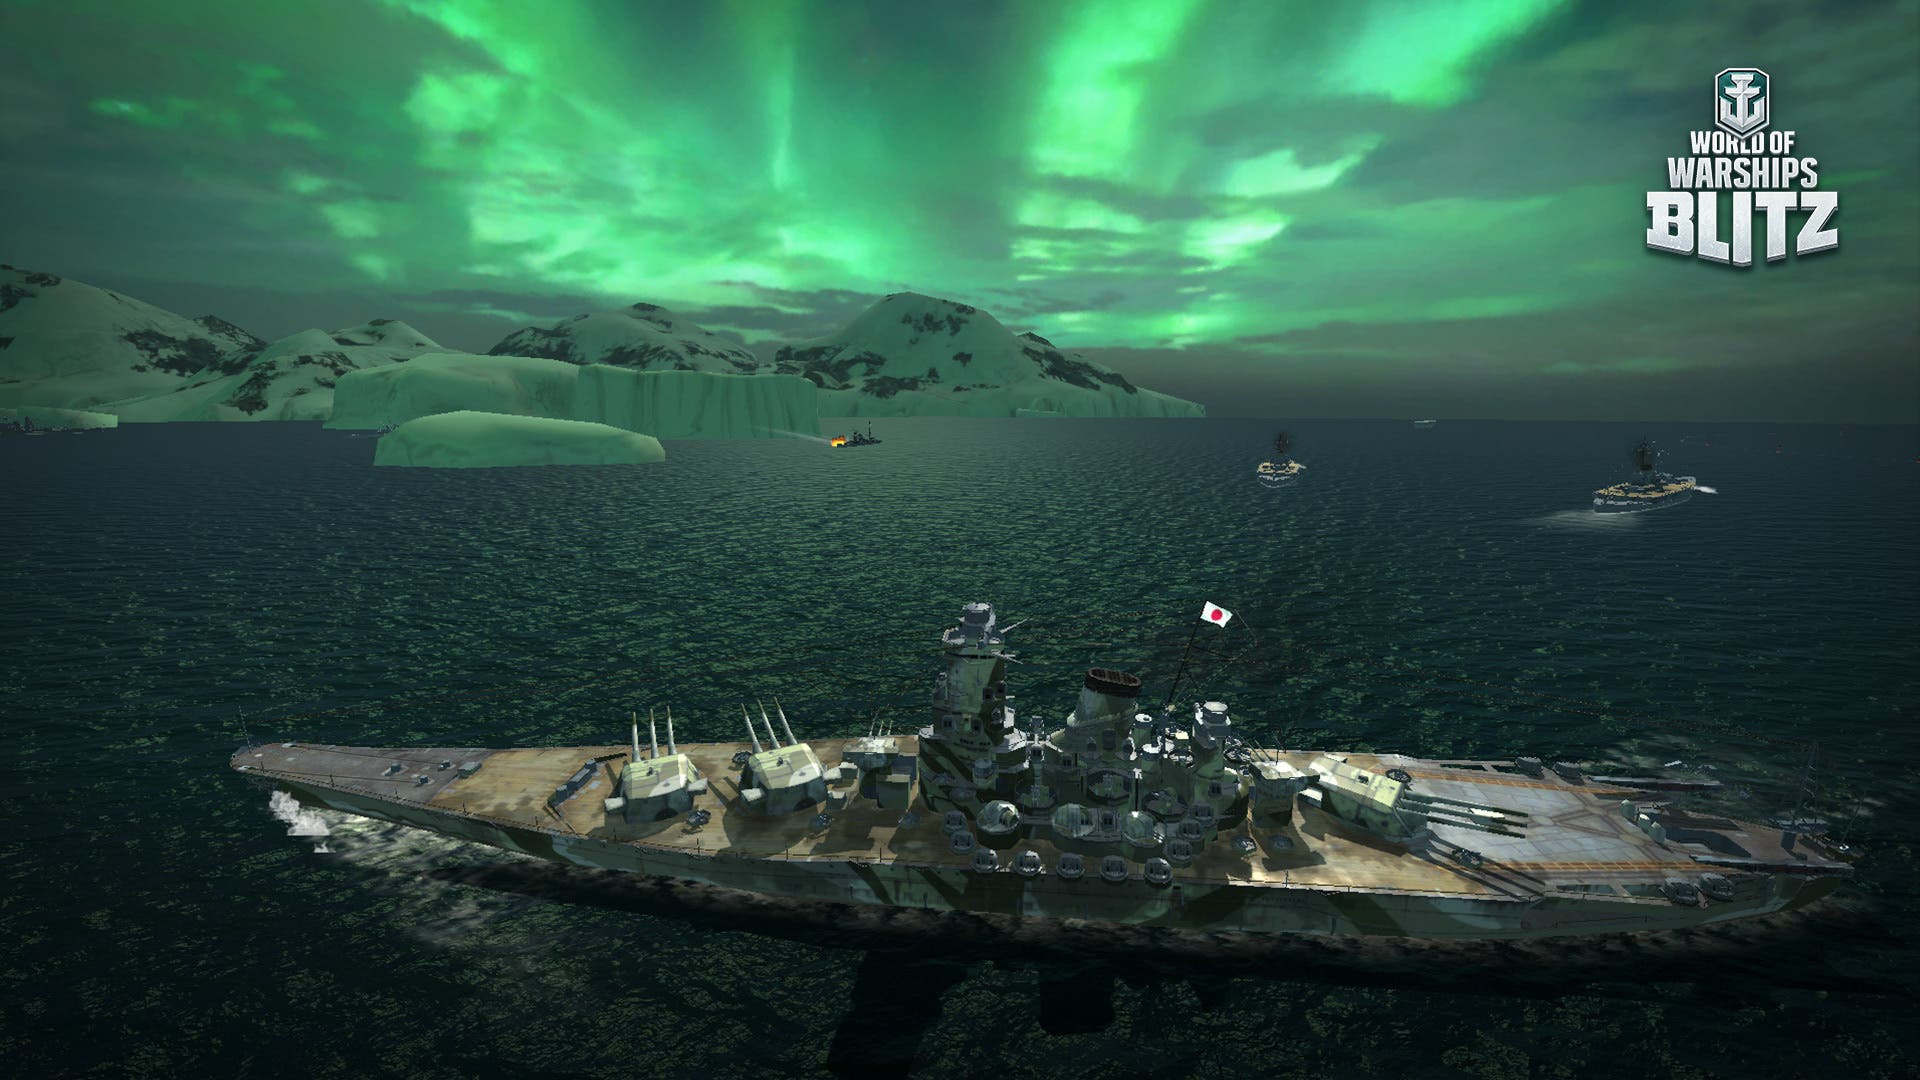 World of Warships Blitz sets sail onto mobile January 18th